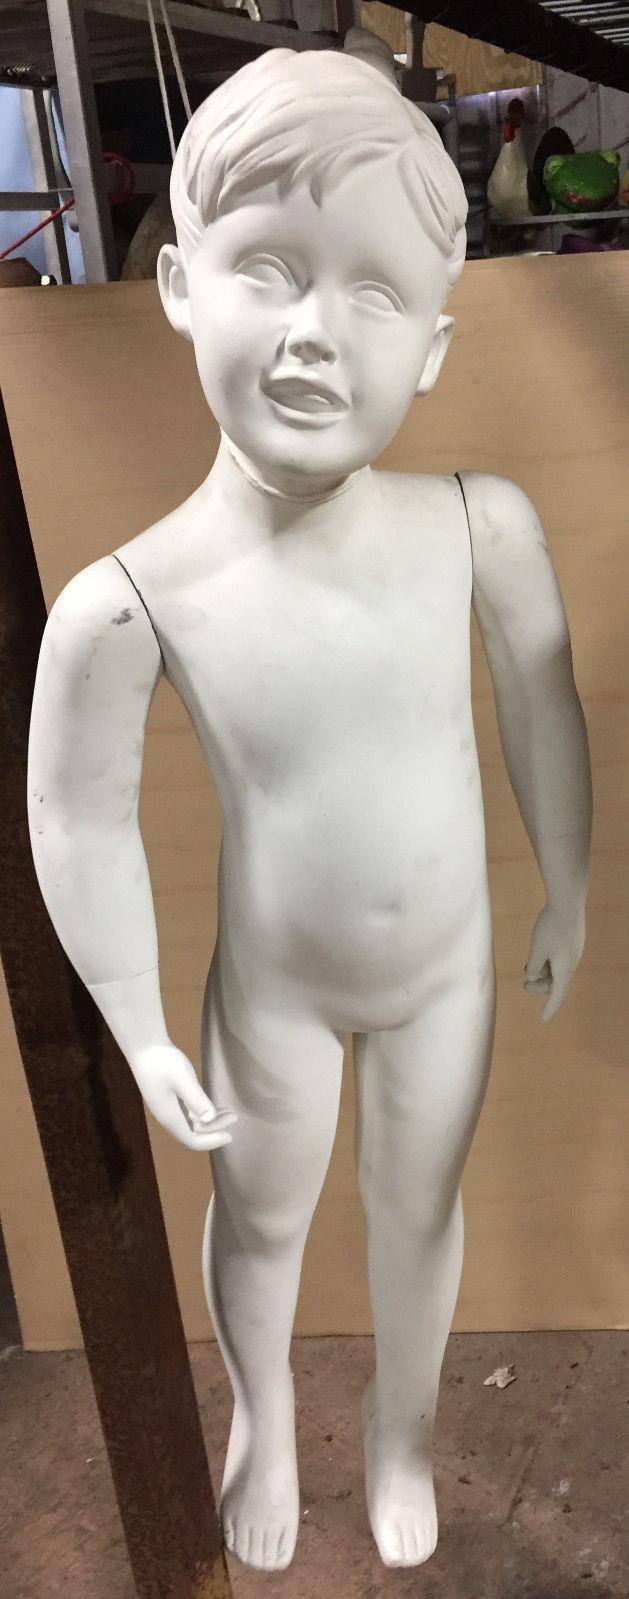 VINTAGE FULL WHITE MANNEQUIN  CHILD YOUTH